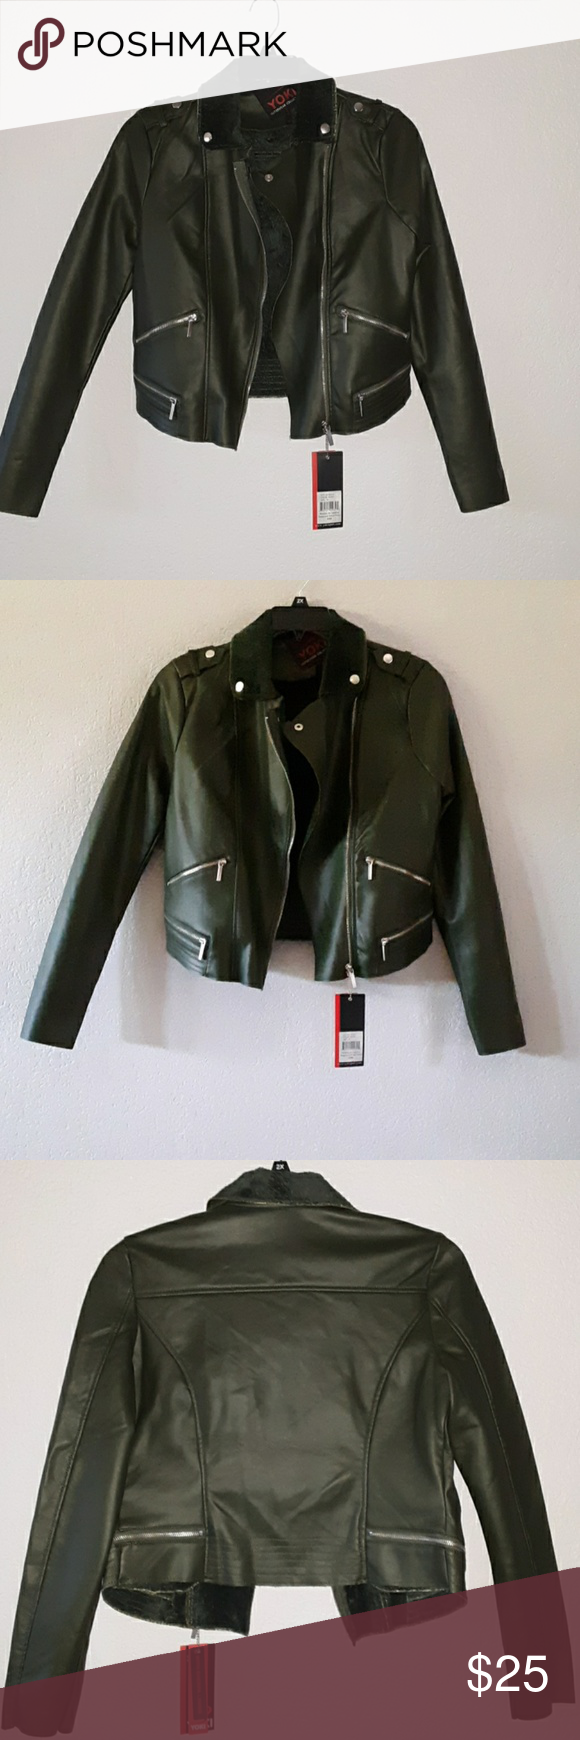 Yoki Outerwear Collection Faux Leather Jacket Leather Jacket Faux Leather Jackets Jackets [ 1740 x 580 Pixel ]